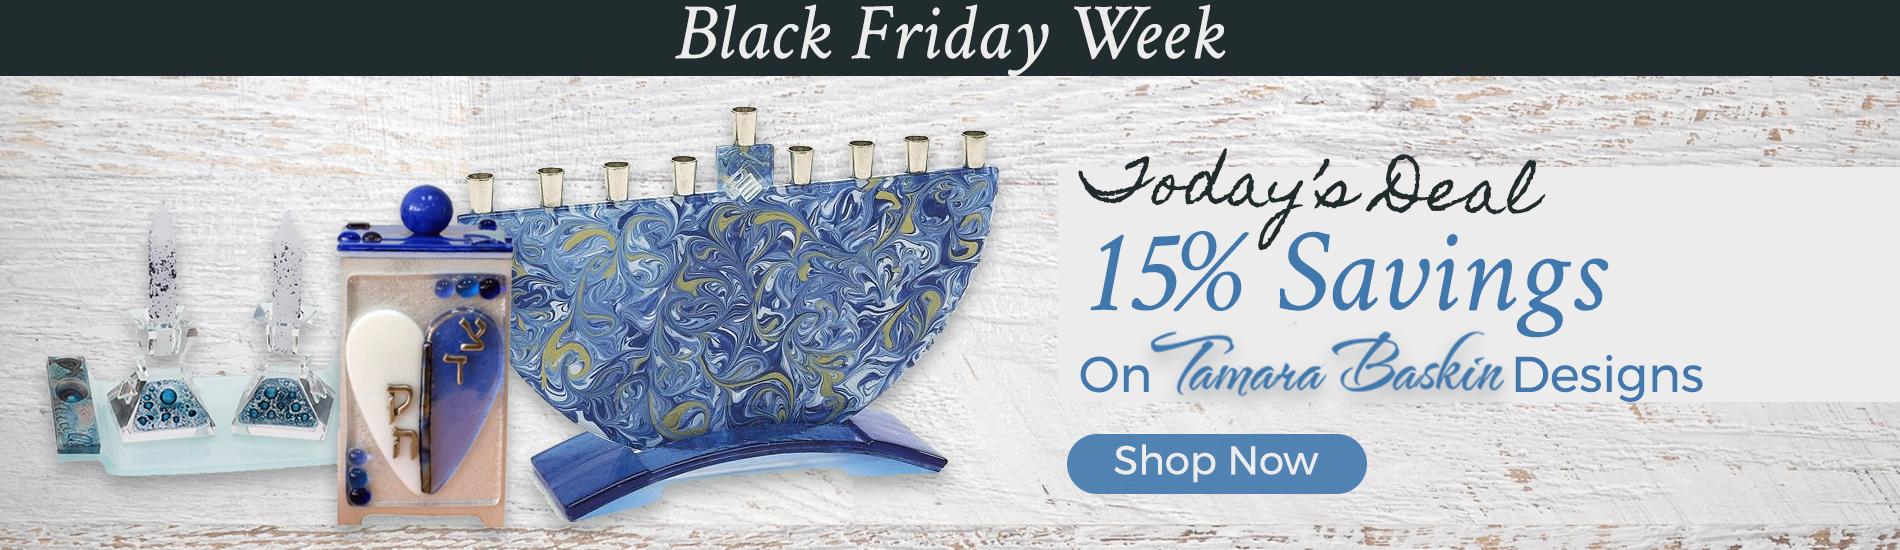 Shop our Black Friday Sales at Judaica.com!